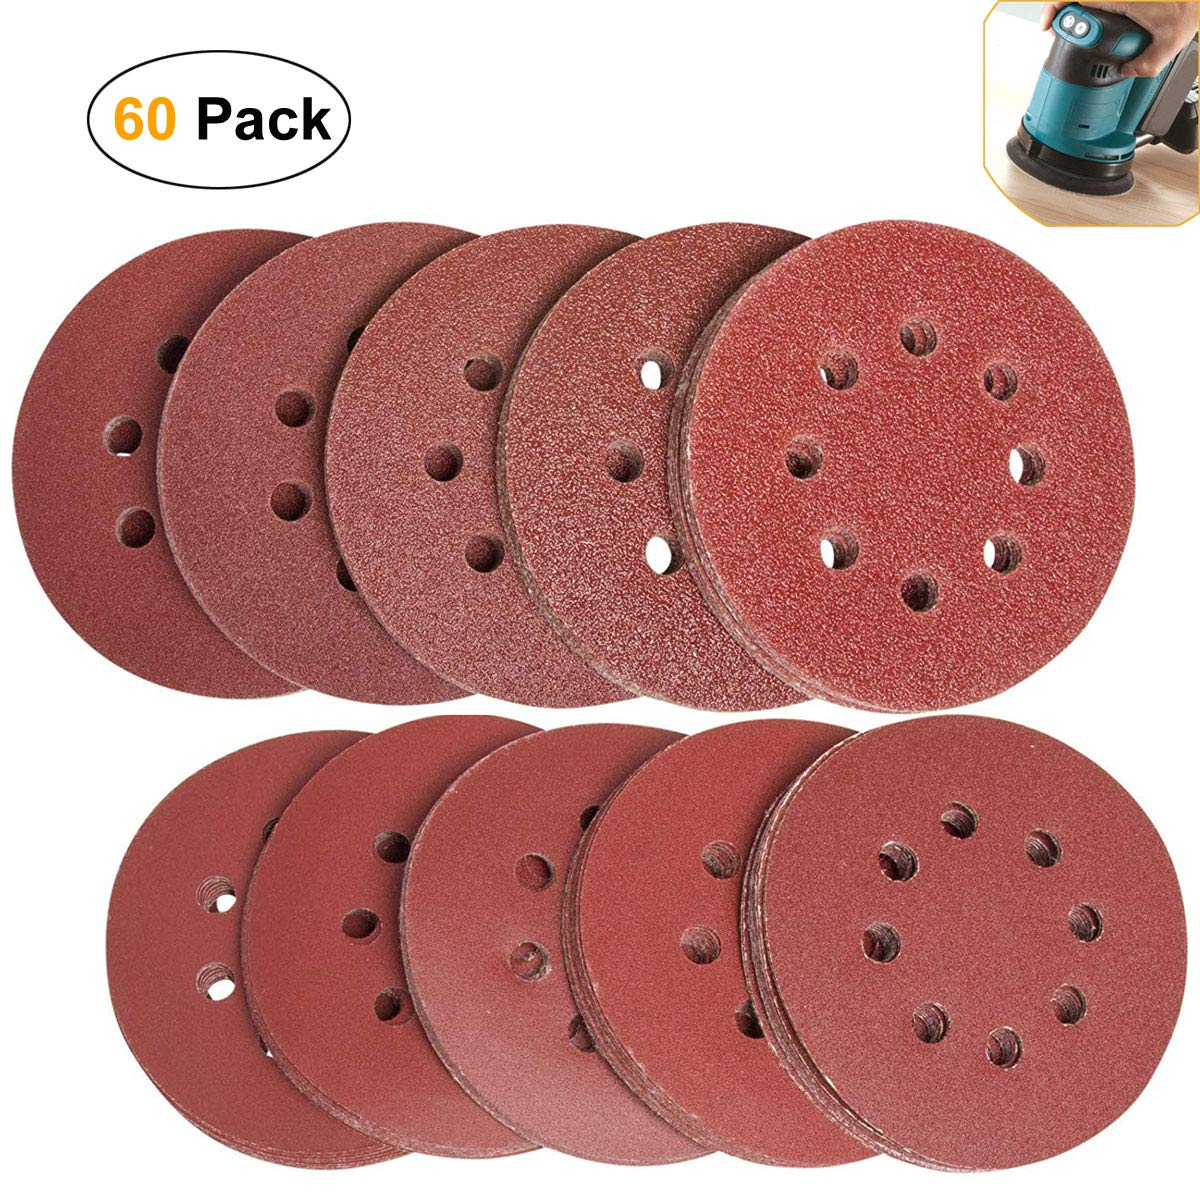 60Pcs Sanding Discs Pads, Augola Hook and Loop 40 60 80 100 120 150 180 240 320 400 Mixed Grits 125mm Sander Paper for Random Orbital Sander, 8-Holes